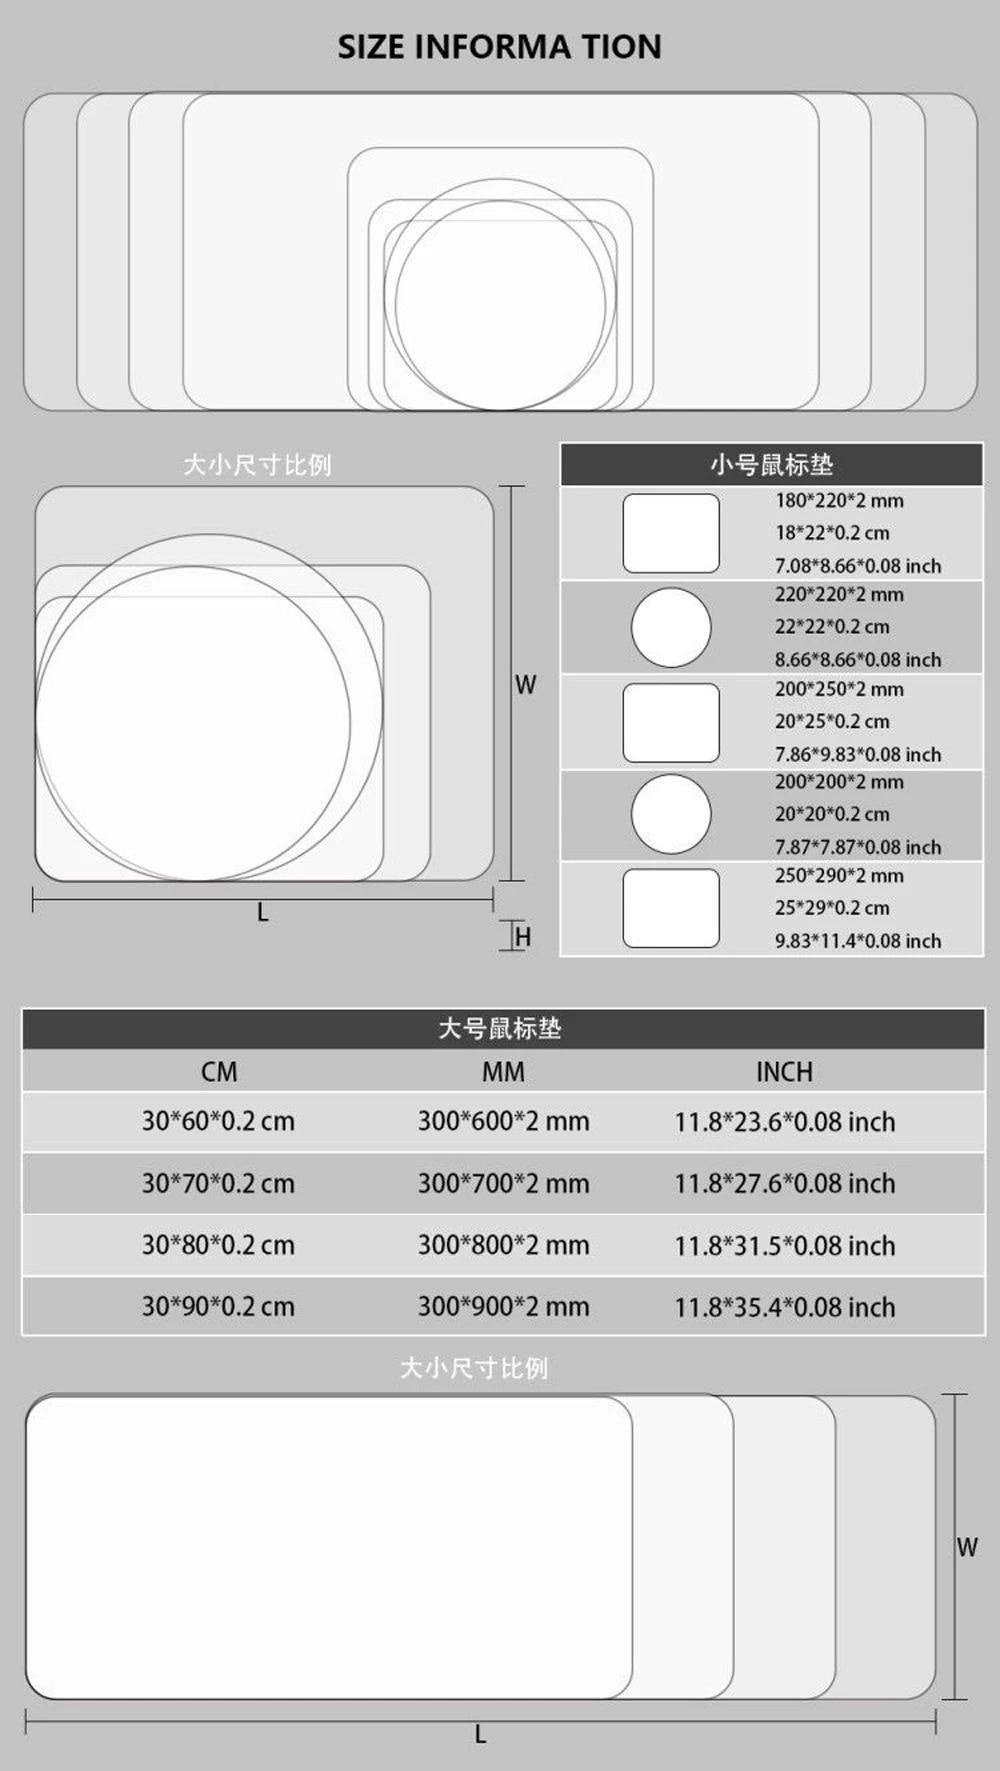 Hed858b4292ec42729d99d72e061f6db3t - Anime Mousepads